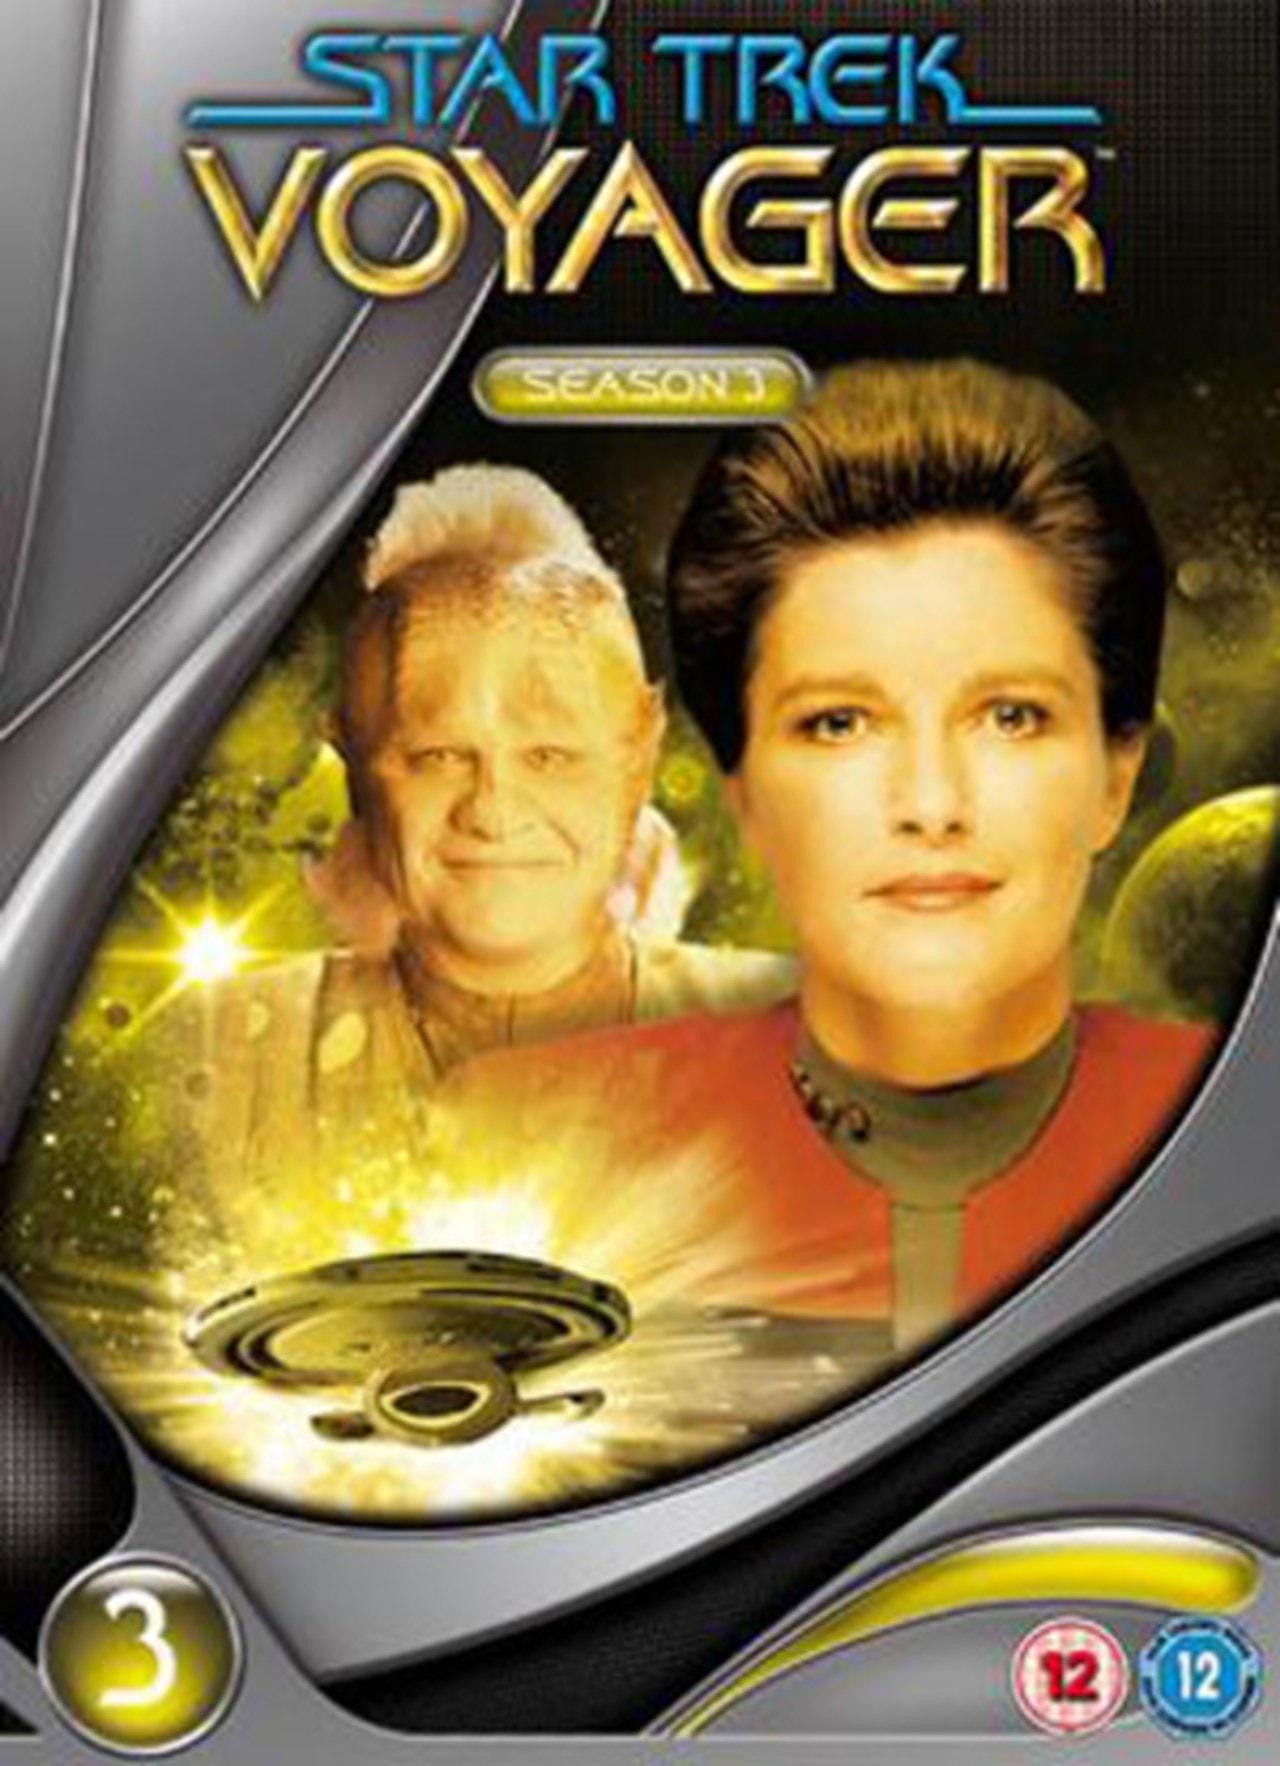 Star Trek Voyager: Season 3 - 1